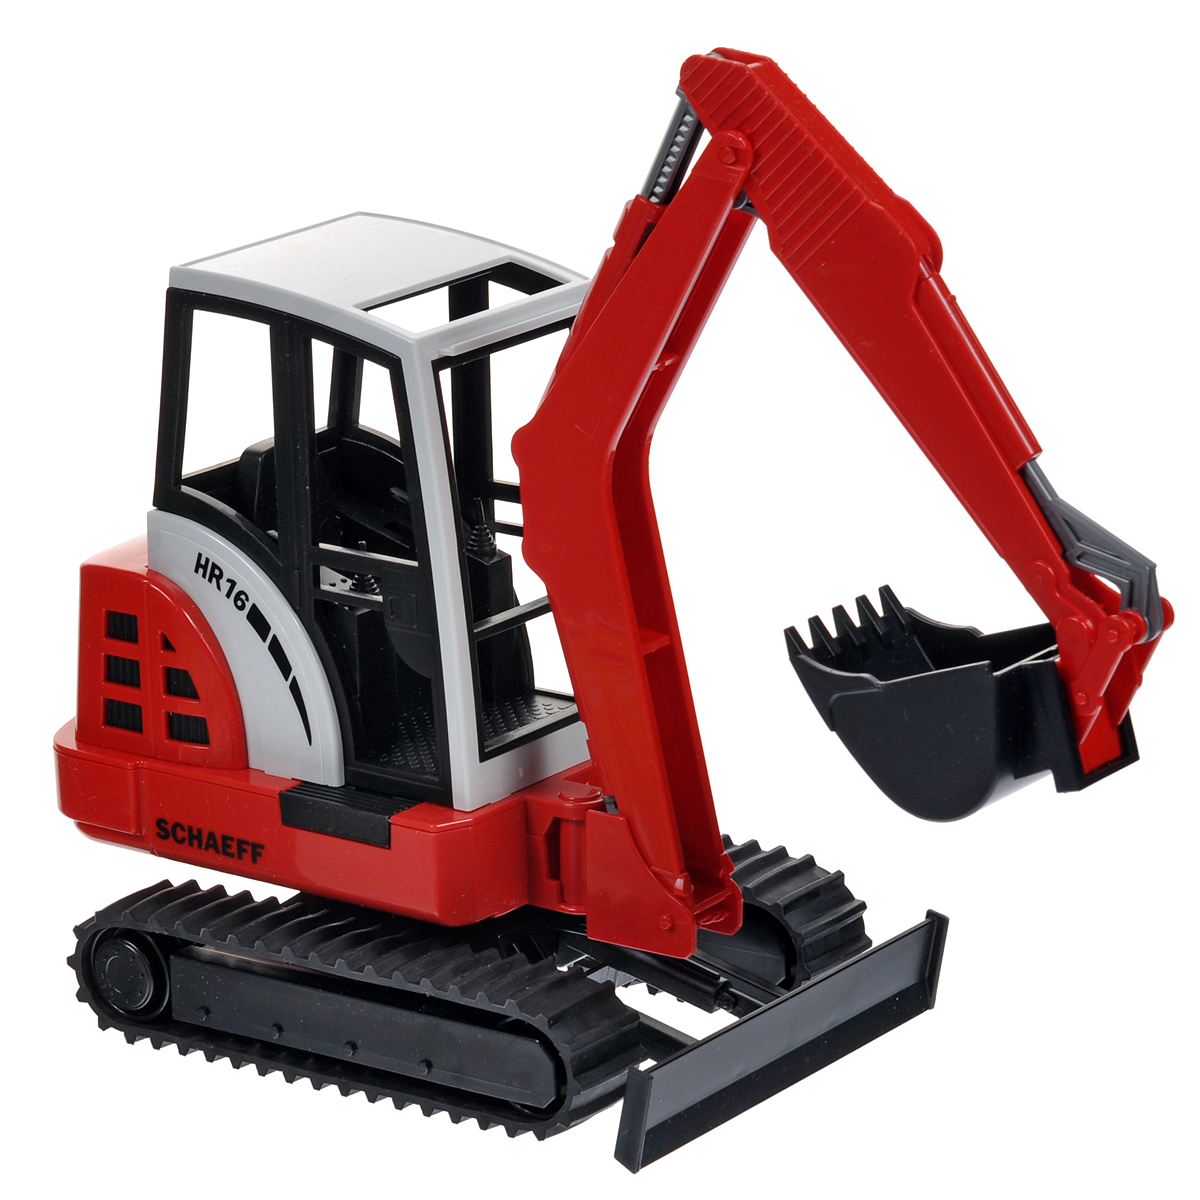 Bruder Мини-экскаватор гусеничный Schaeff HR16 машина bruder schaeff hr16 мини экскаватор гусеничный 02 432